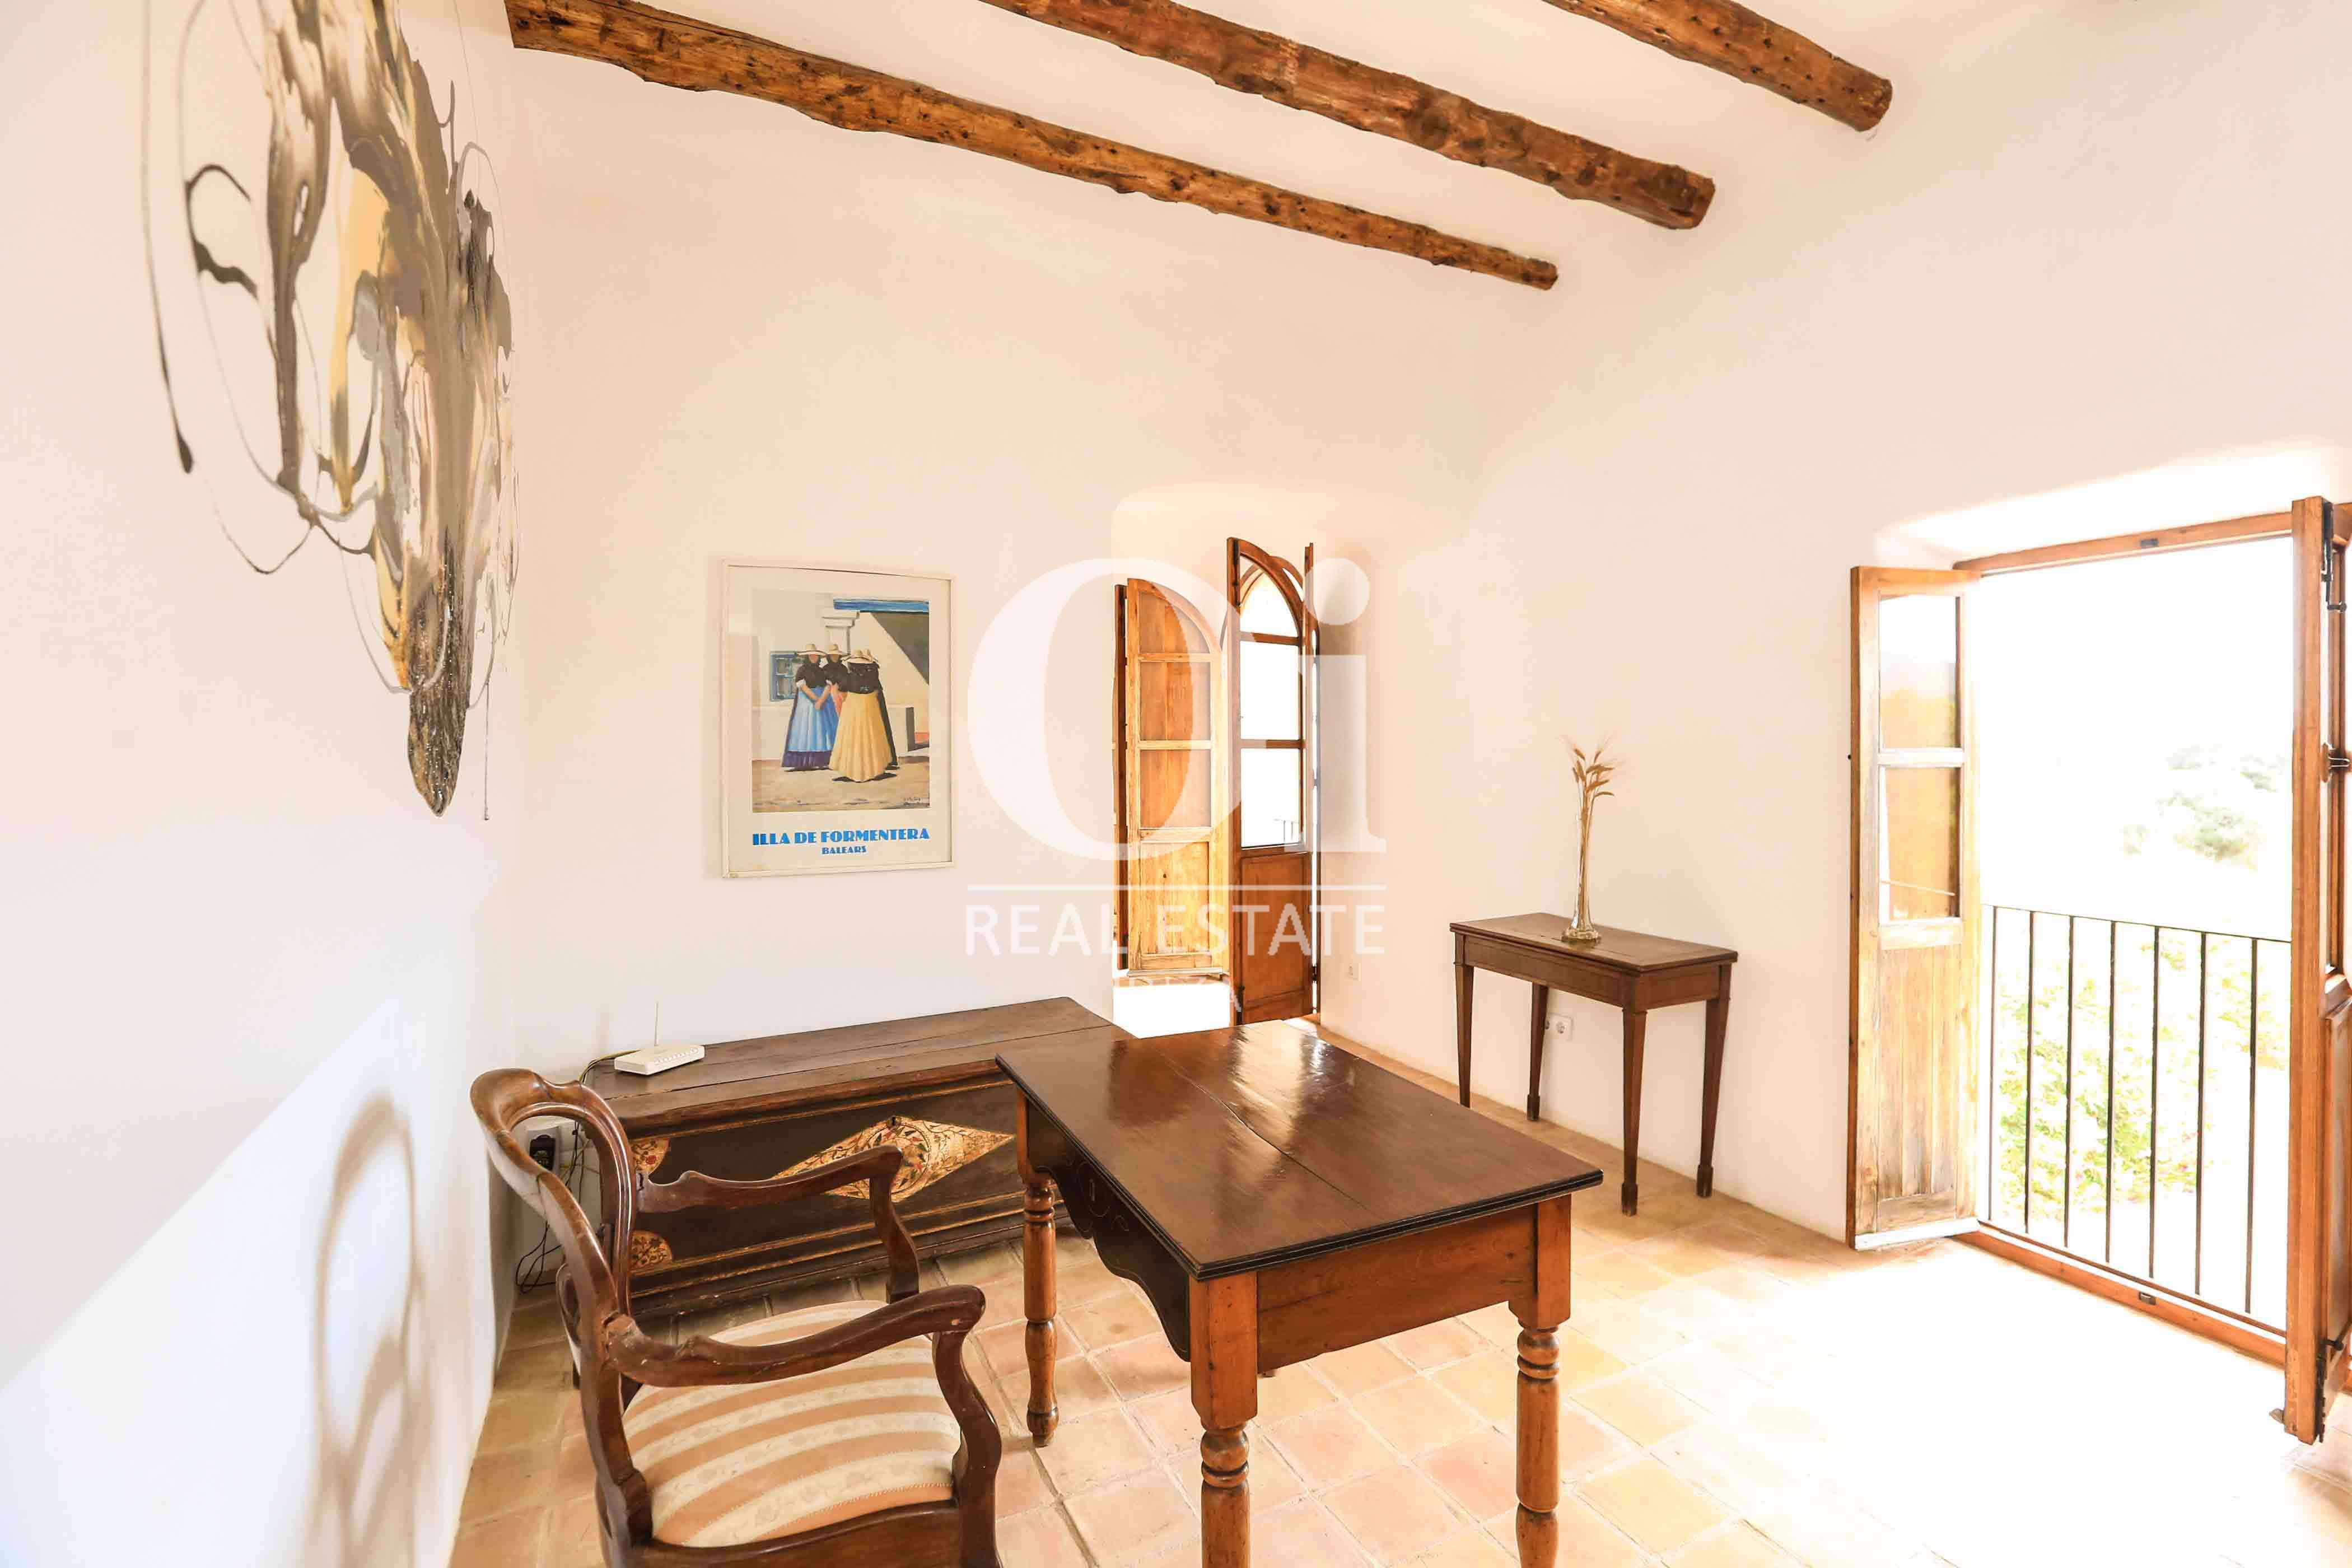 Despacho de casa en alquiler vacacional en zona Puig d'en Valls, Ibiza